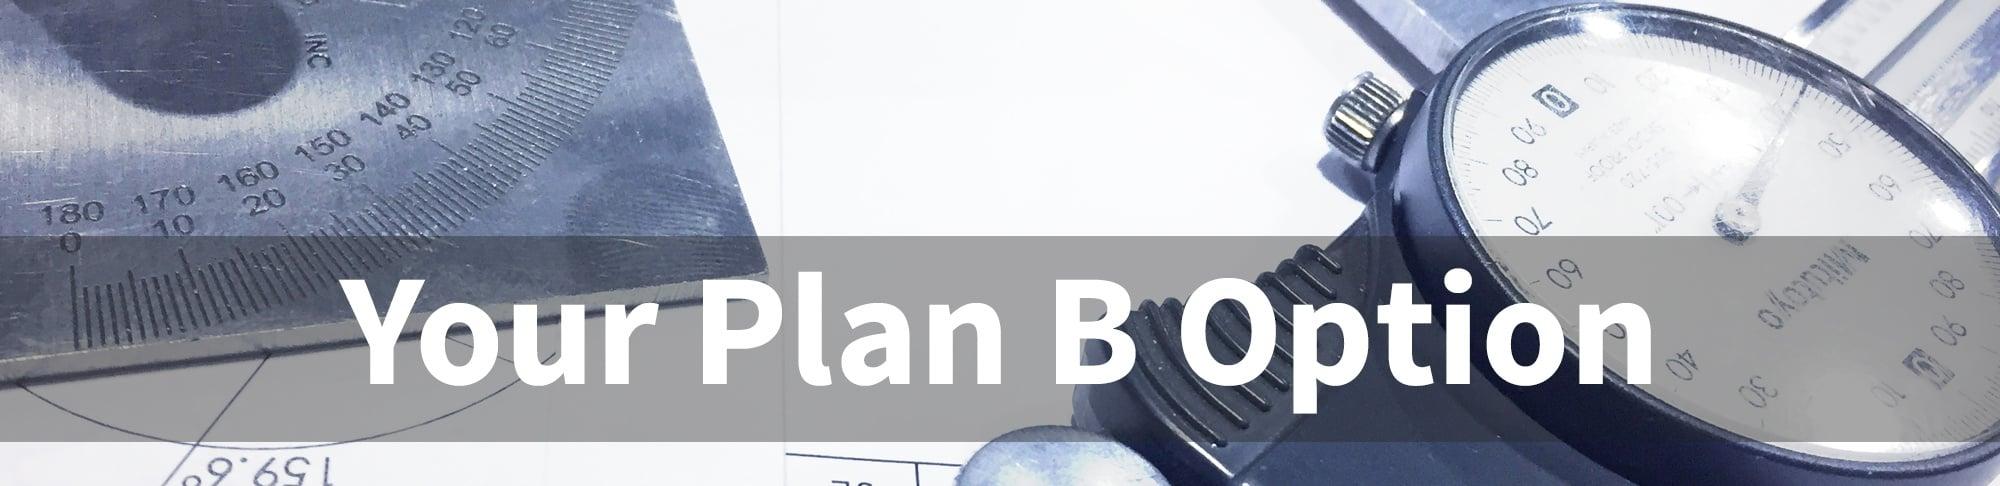 PlanB2.jpg